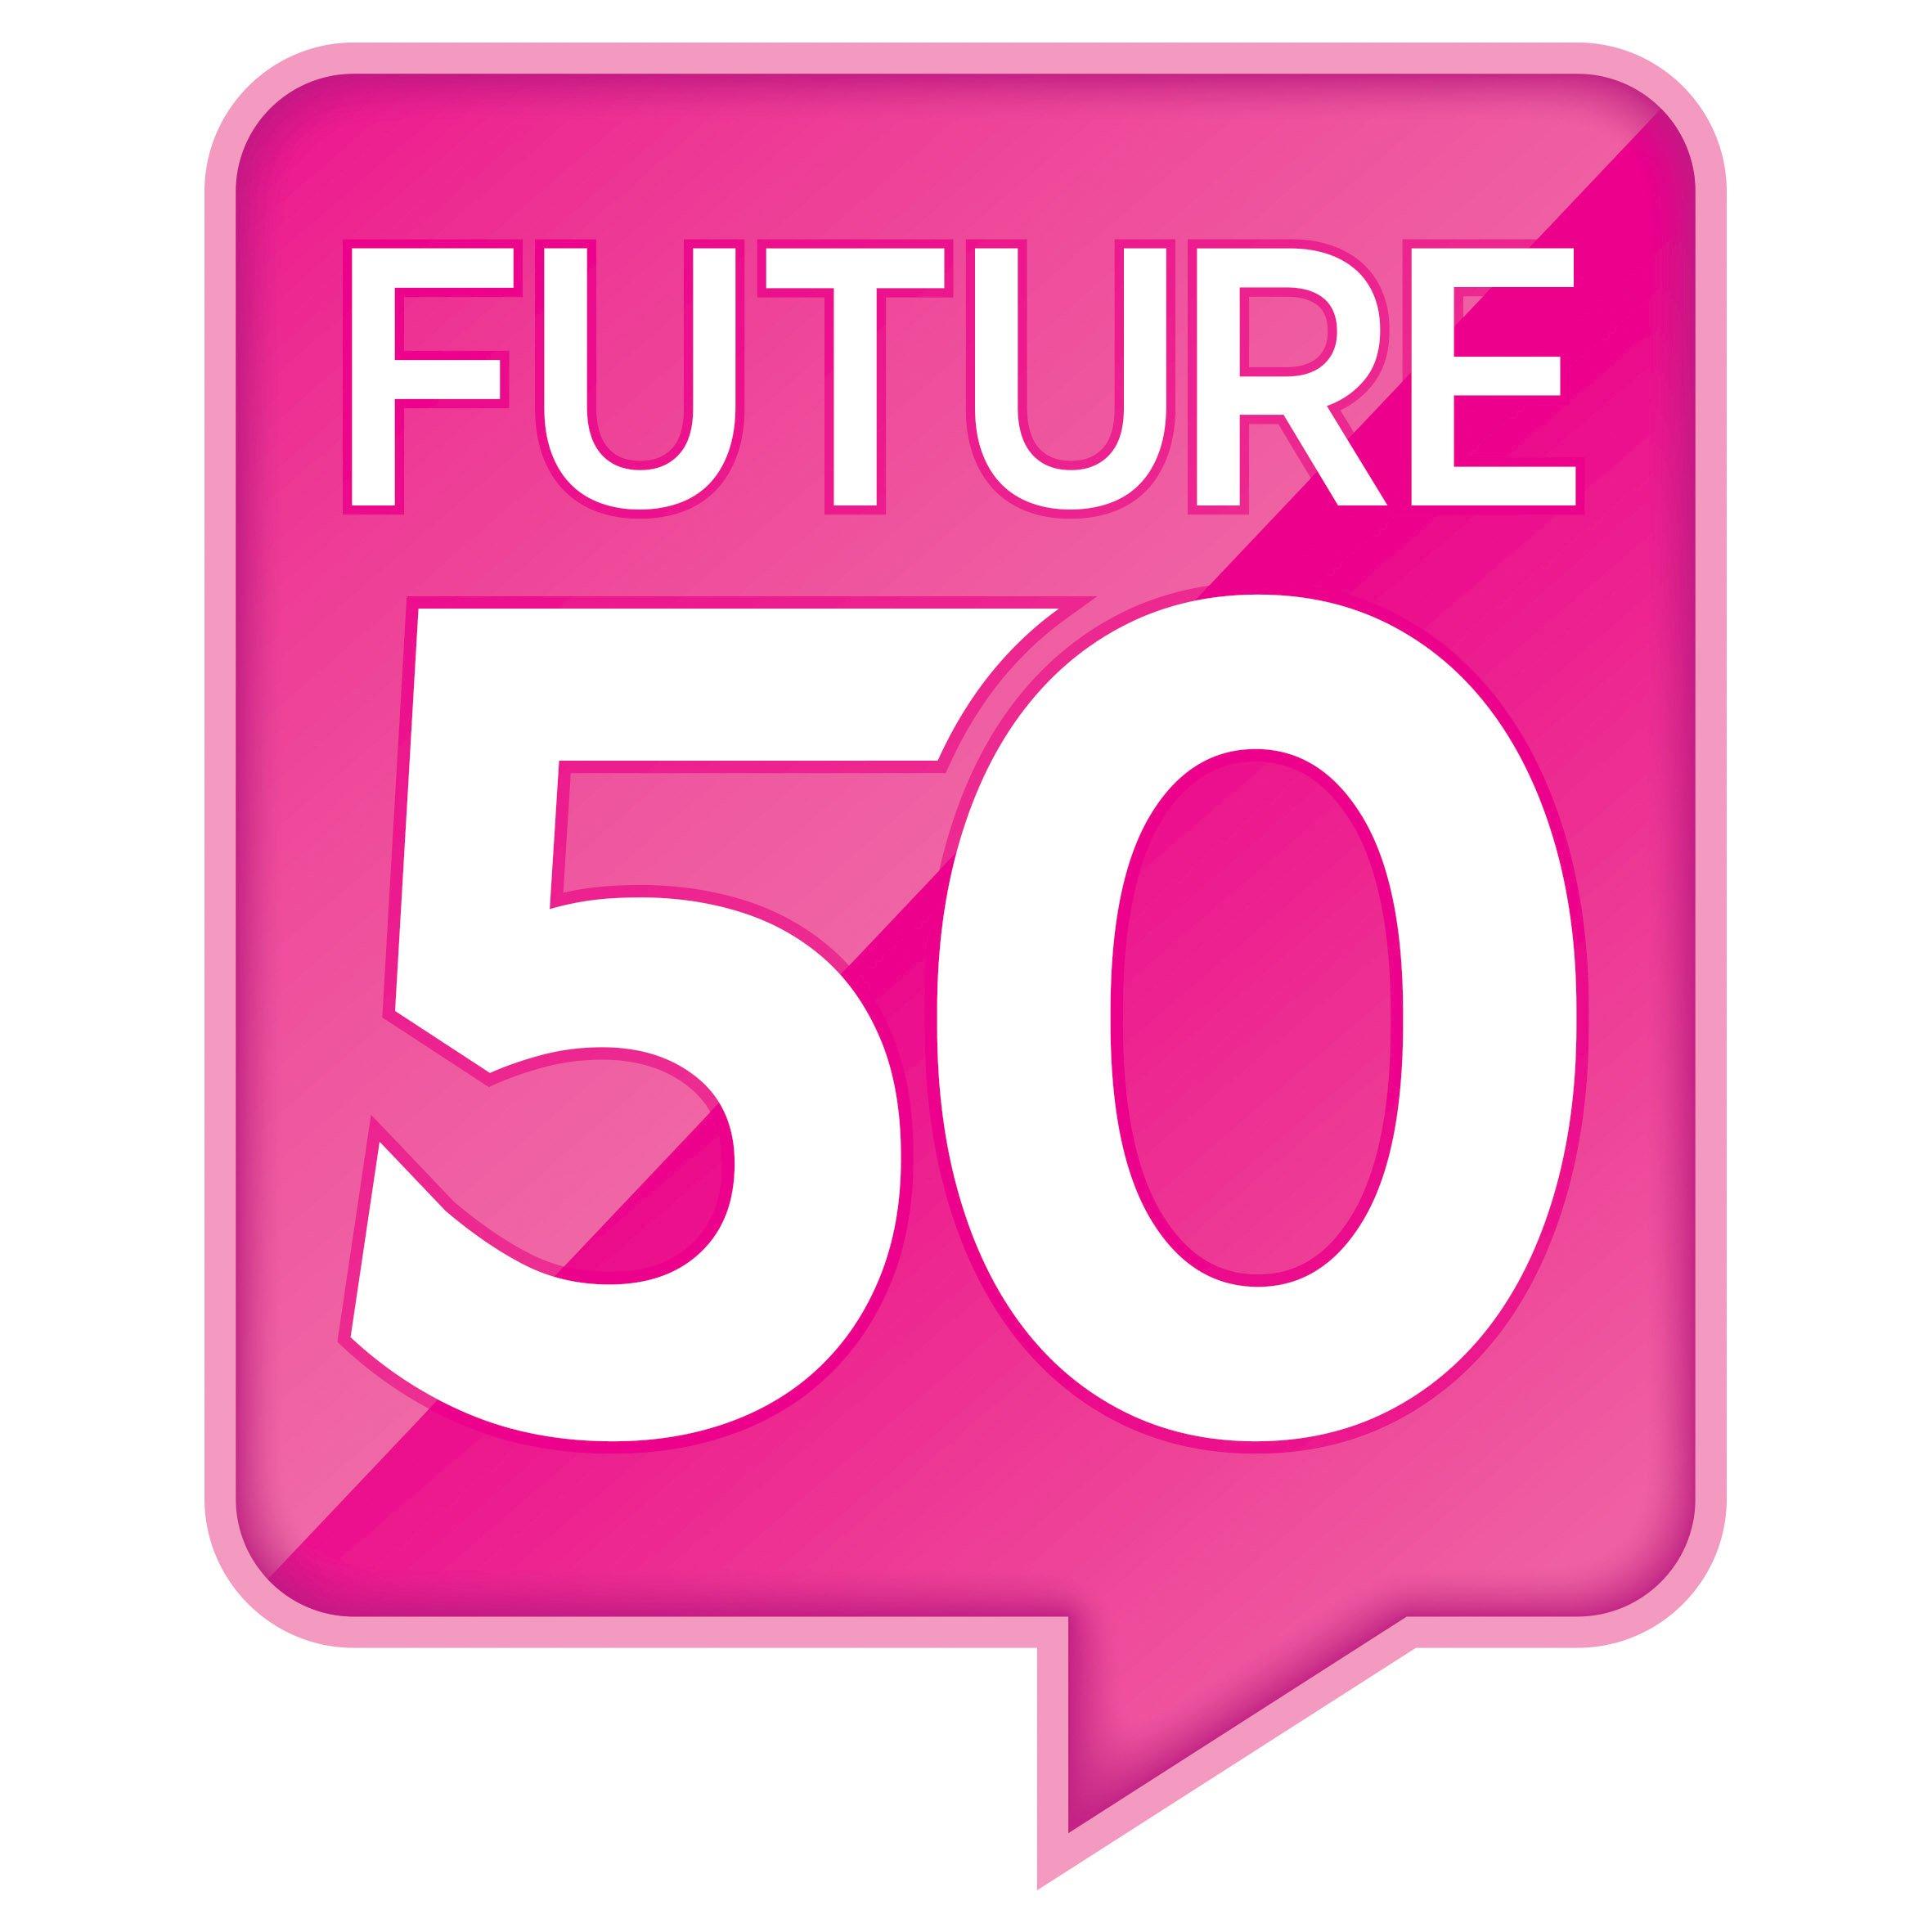 https://www.abatepestmanagement.co.uk/wp-content/uploads/2020/11/Future50-Final-Logo.jpg